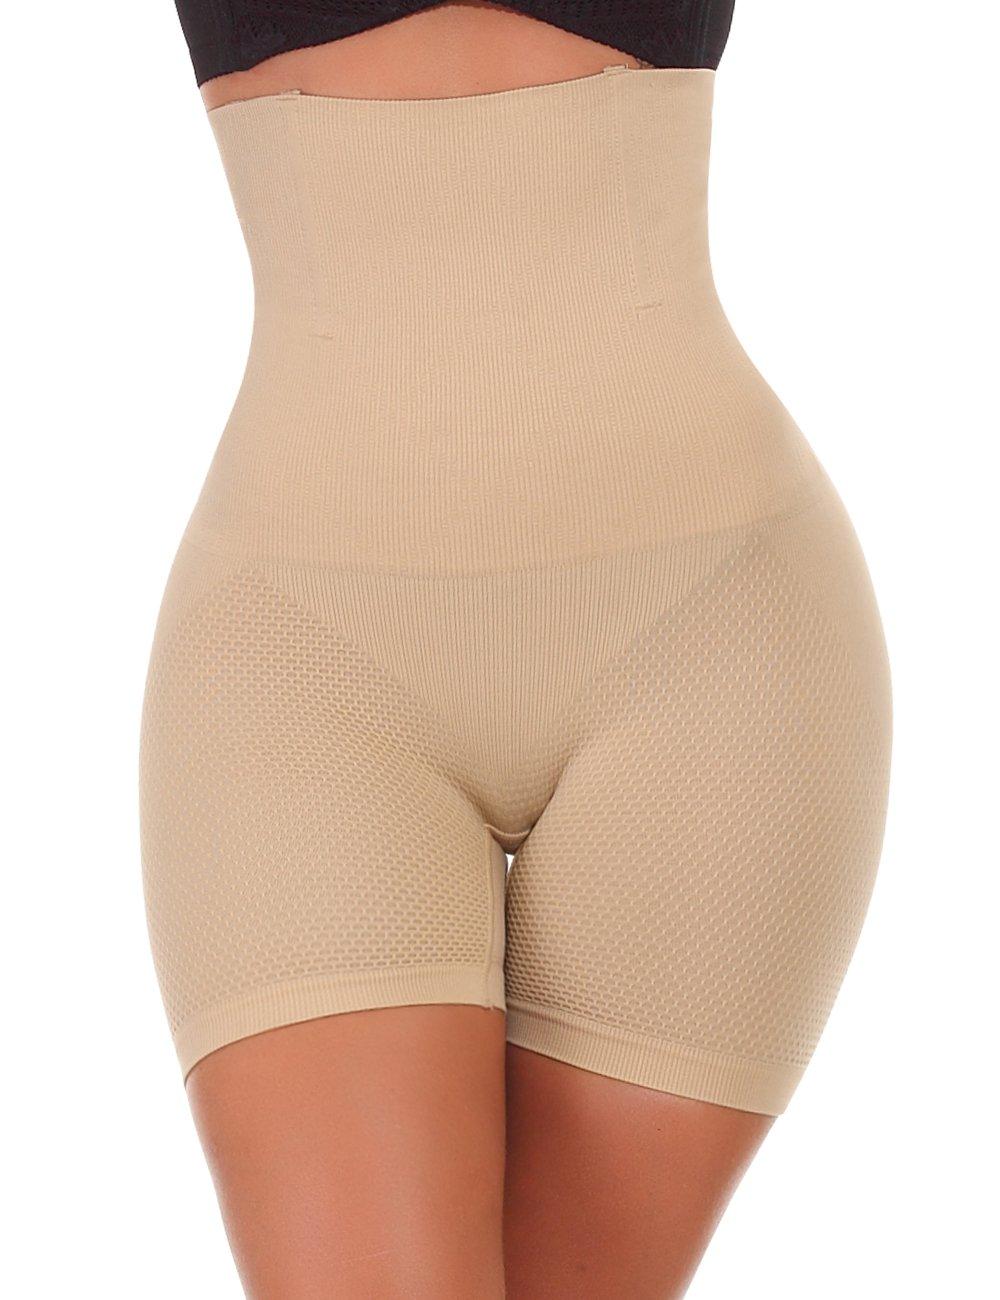 NINGMI Women High-Waisted Tummy Control Bodyshaper Butt Lifter Boyshorts Control Knickers Slimming Briefs NMUK836